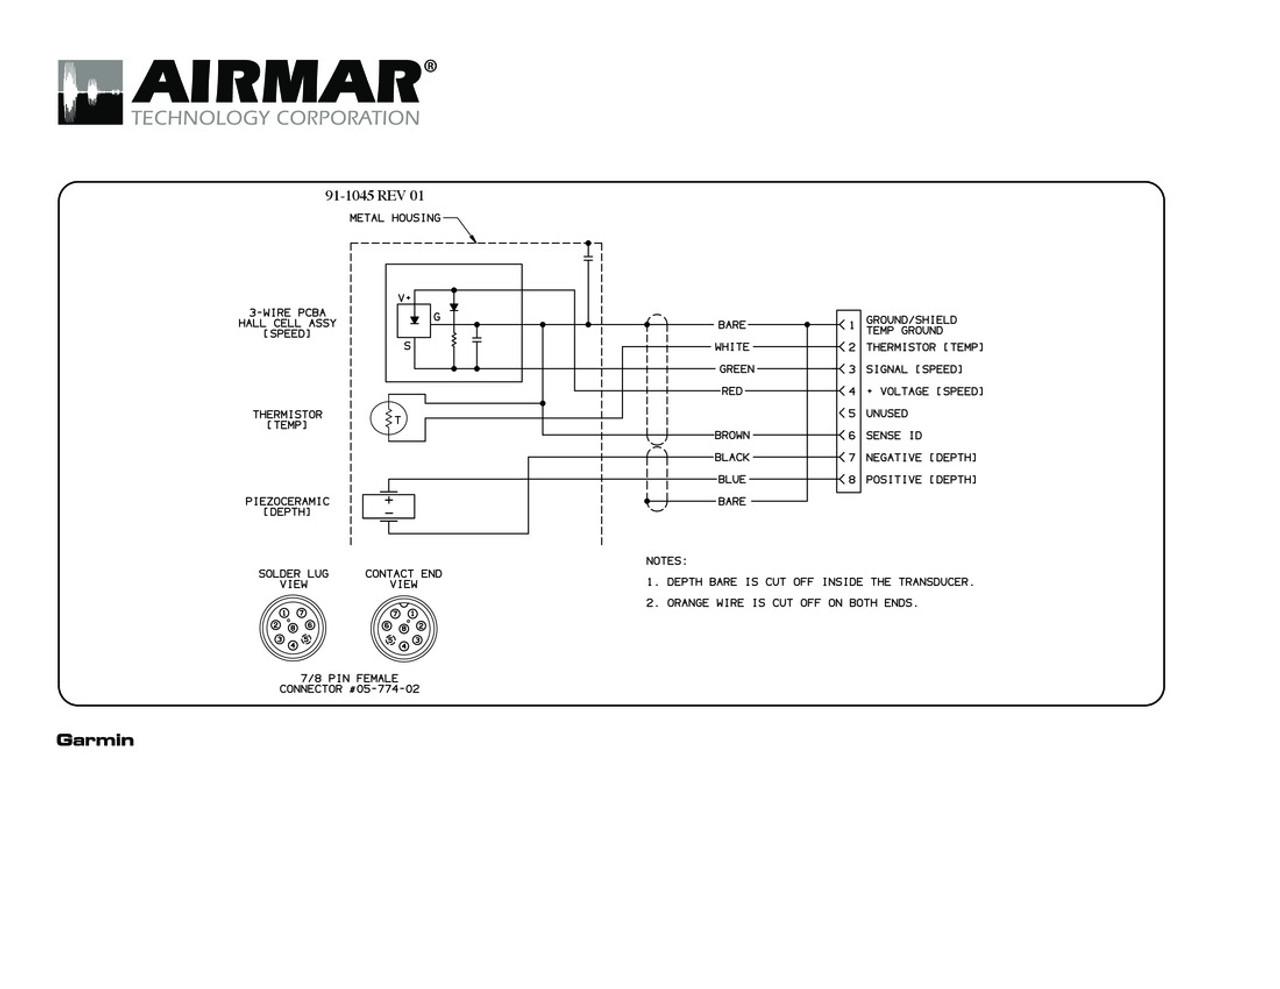 medium resolution of depth speed temperature b744v vl 600w transducers with garmin 8 pin connector